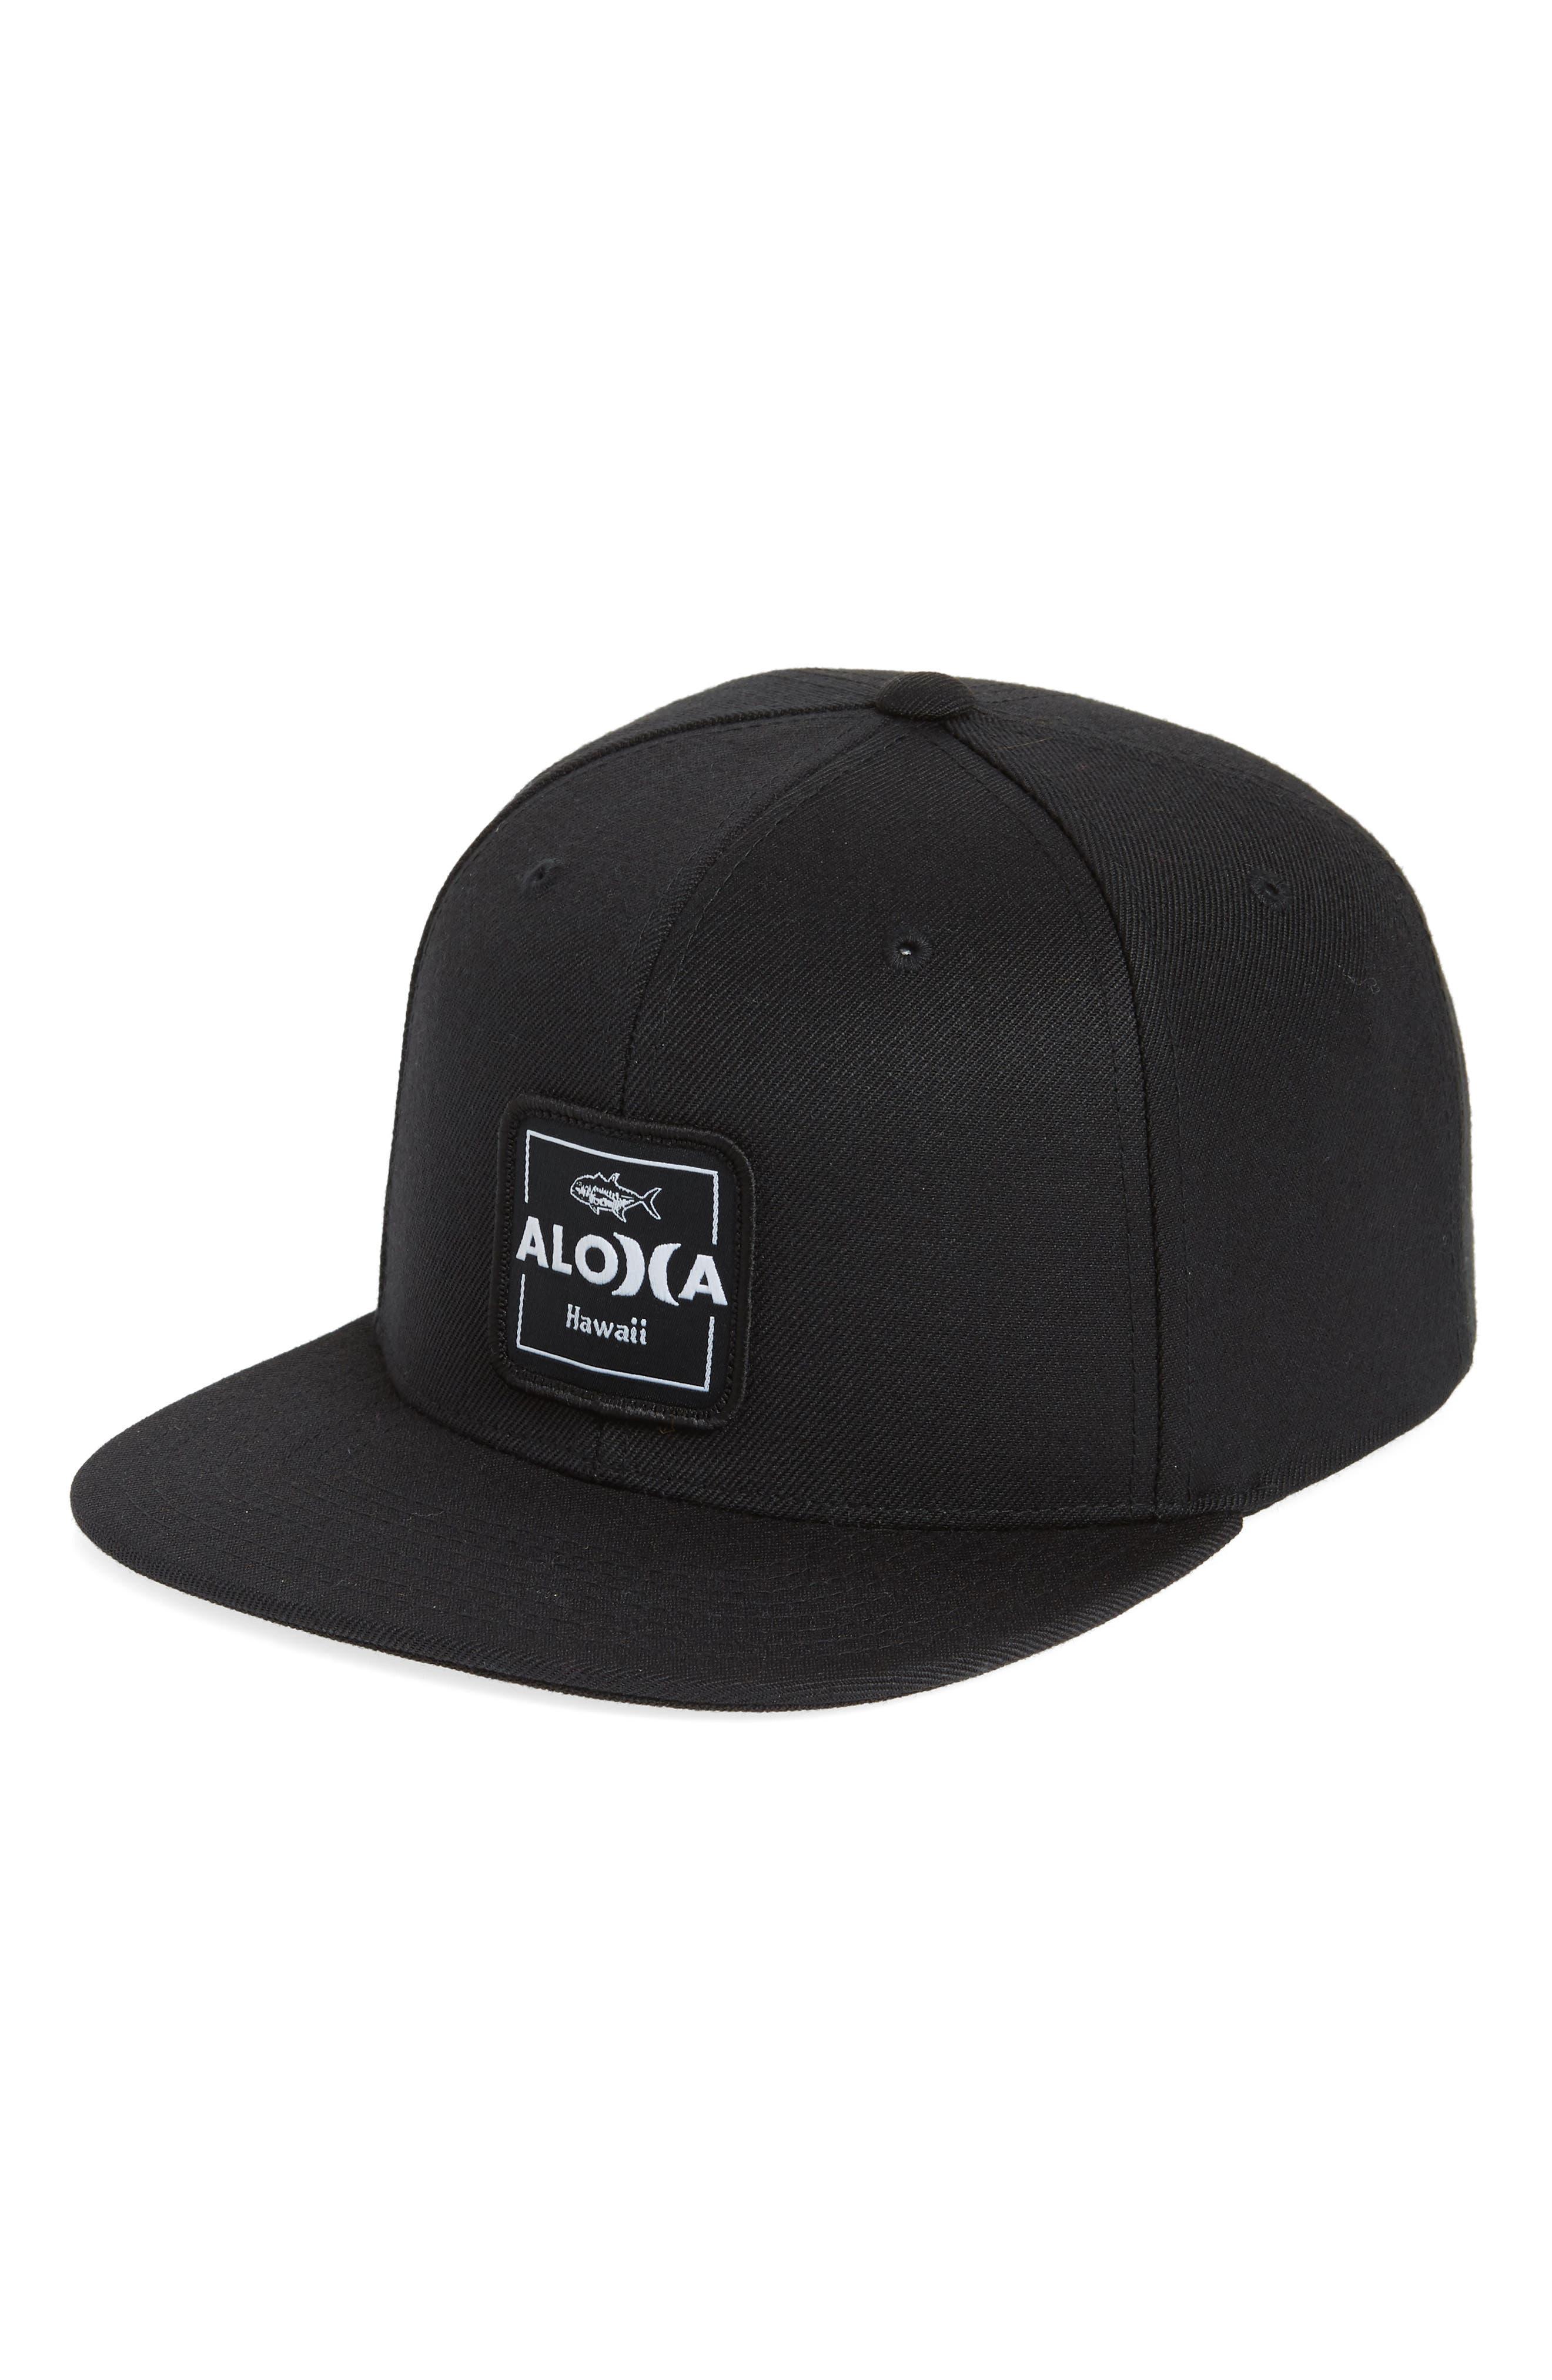 00d4cfaa7 low price hurley aloha cap 22752 c0468